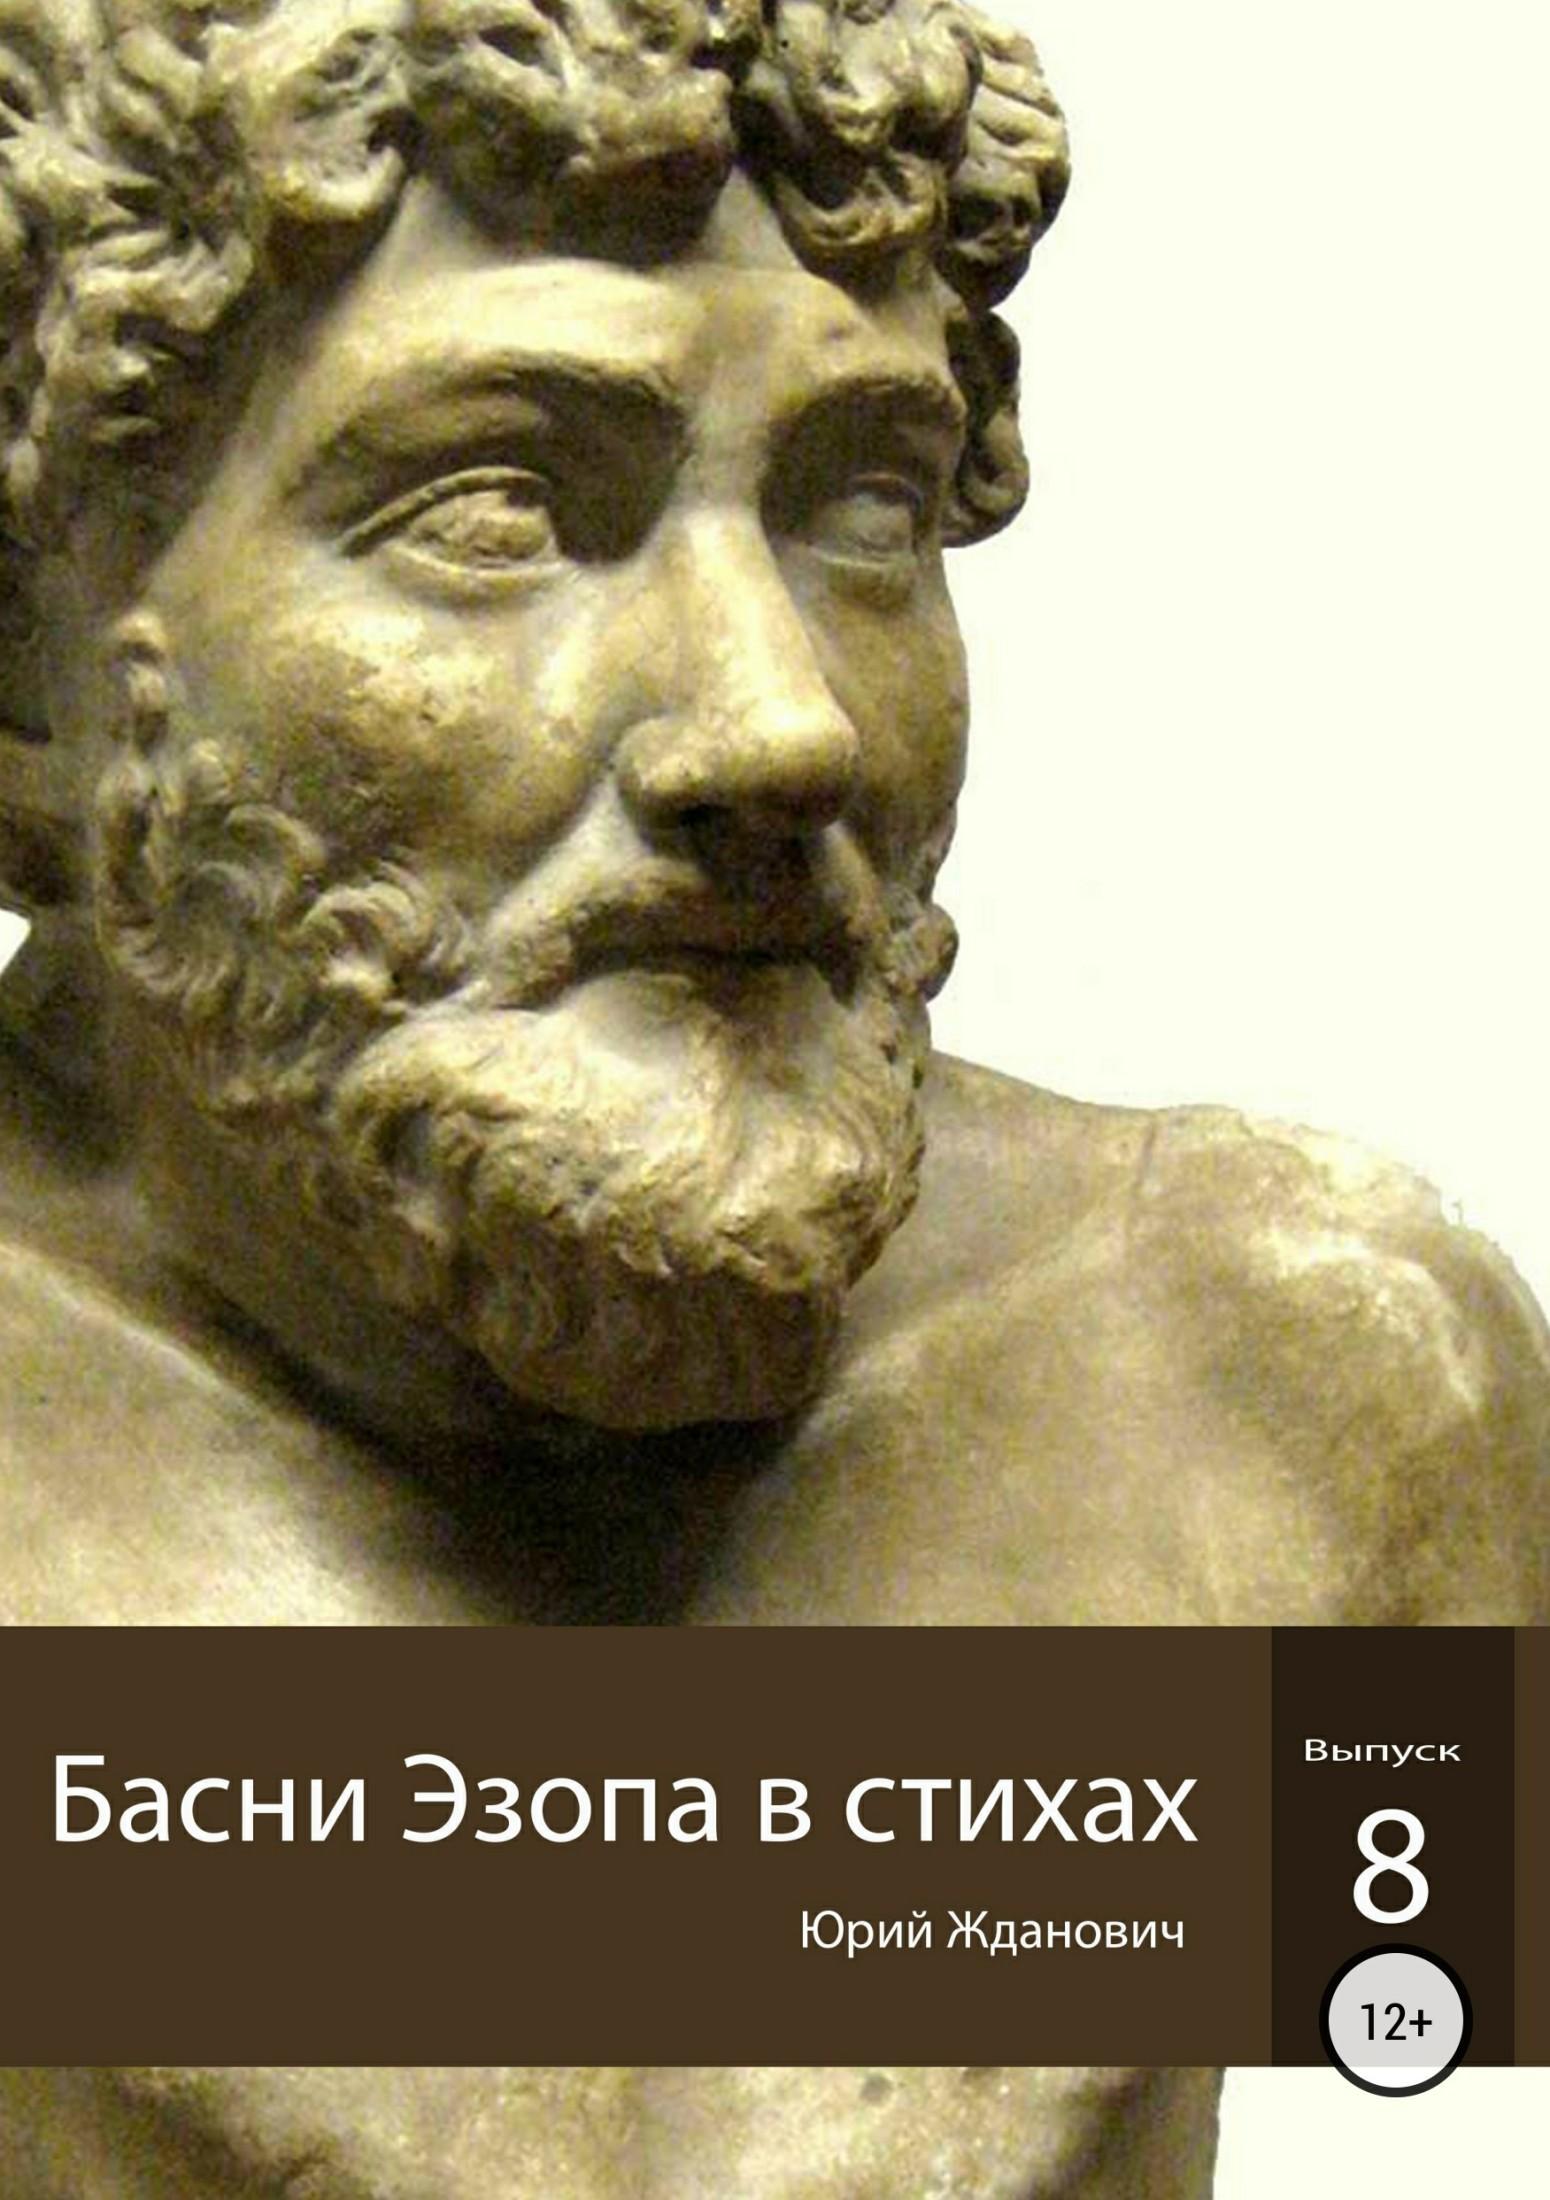 Юрий Михайлович Жданович Басни Эзопа в стихах. Выпуск 8 мастер класс басни с моралью